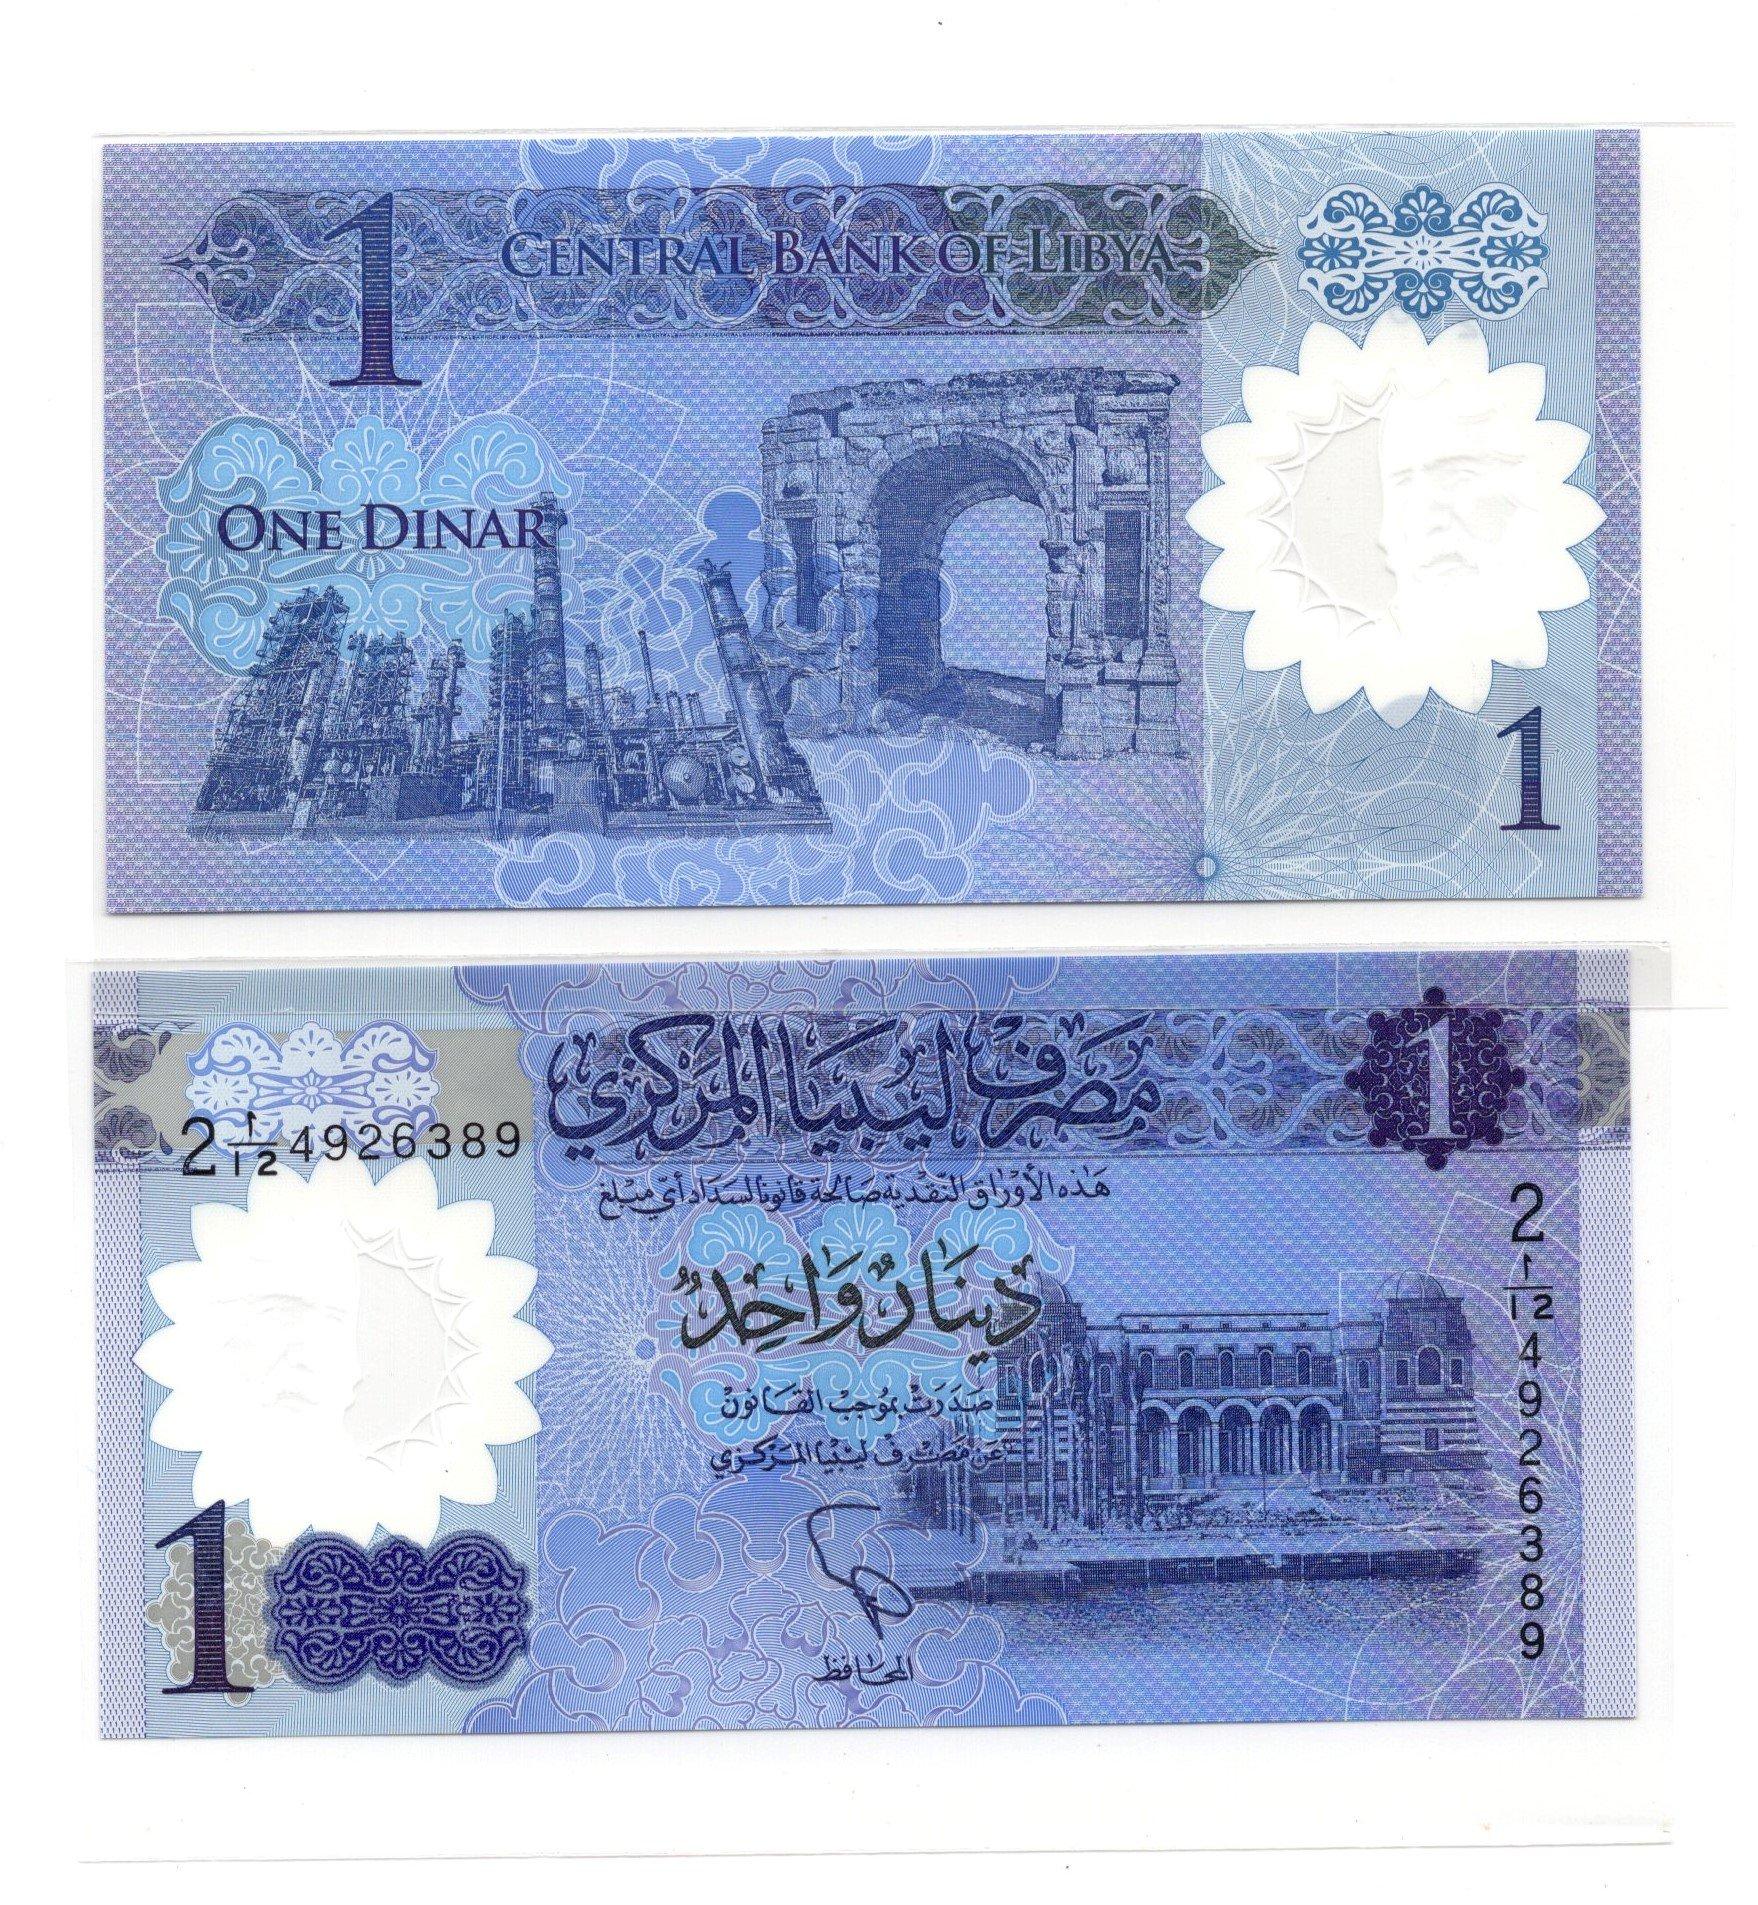 Libya 1 dinar polymer